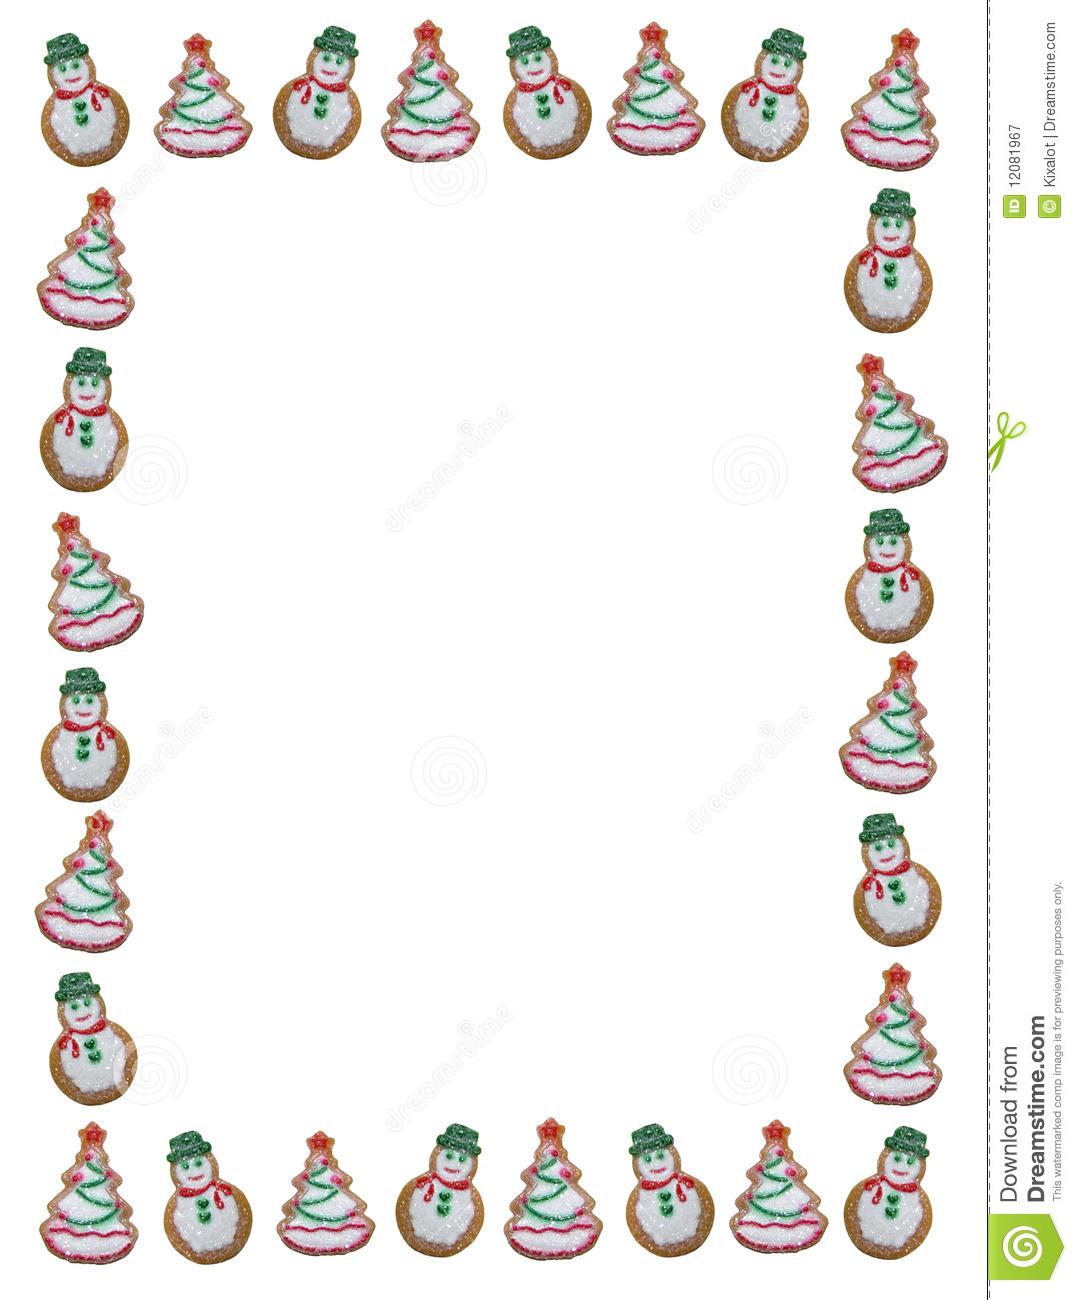 free christmas cookie borders clip art - photo #4